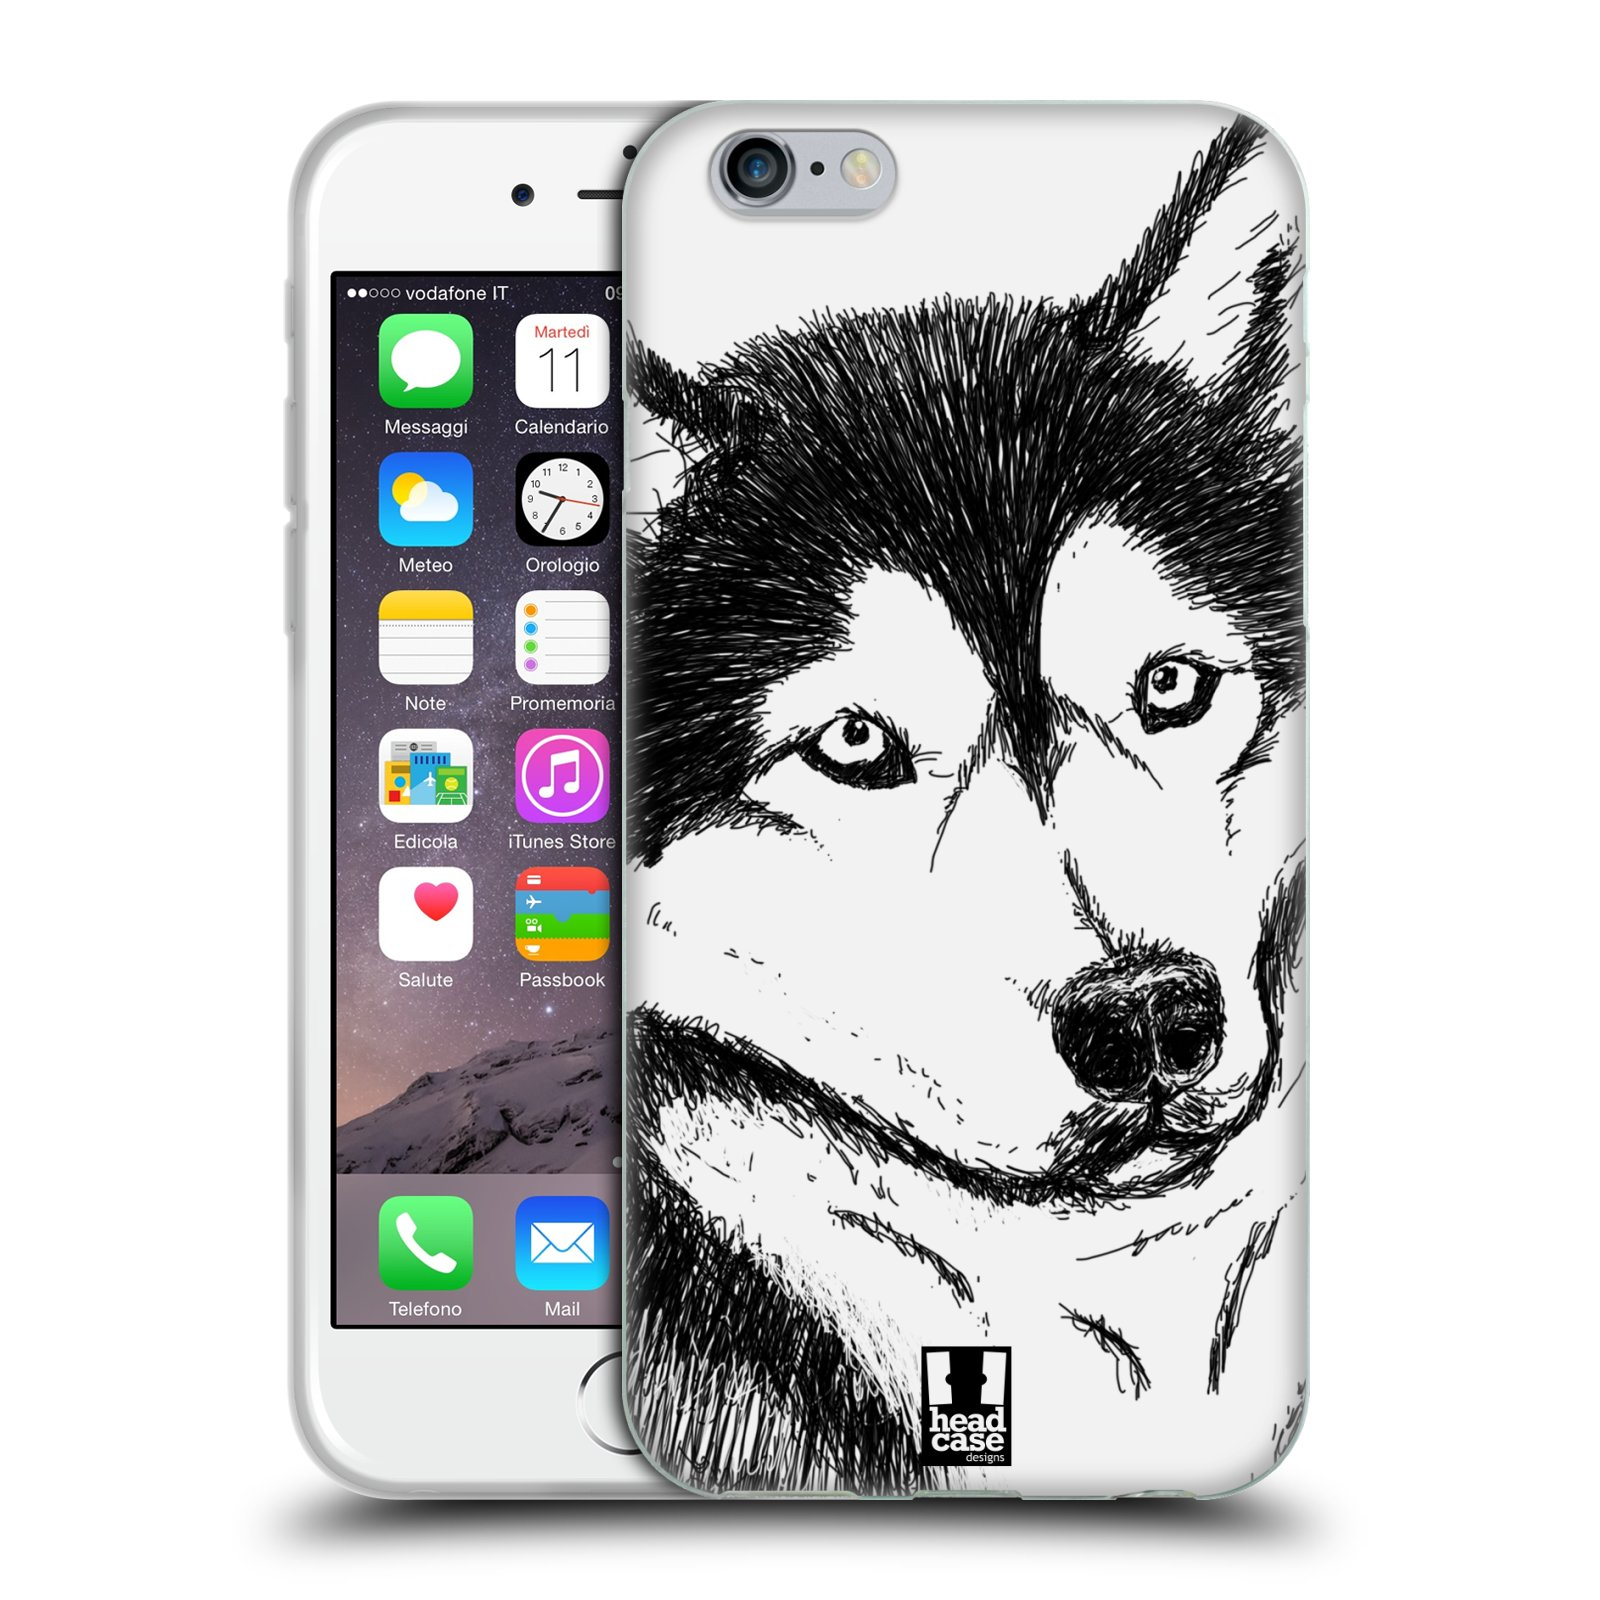 HEAD CASE silikonový obal na mobil Apple Iphone 6/6S vzor Kreslená zvířátka černá a bílá pes husky